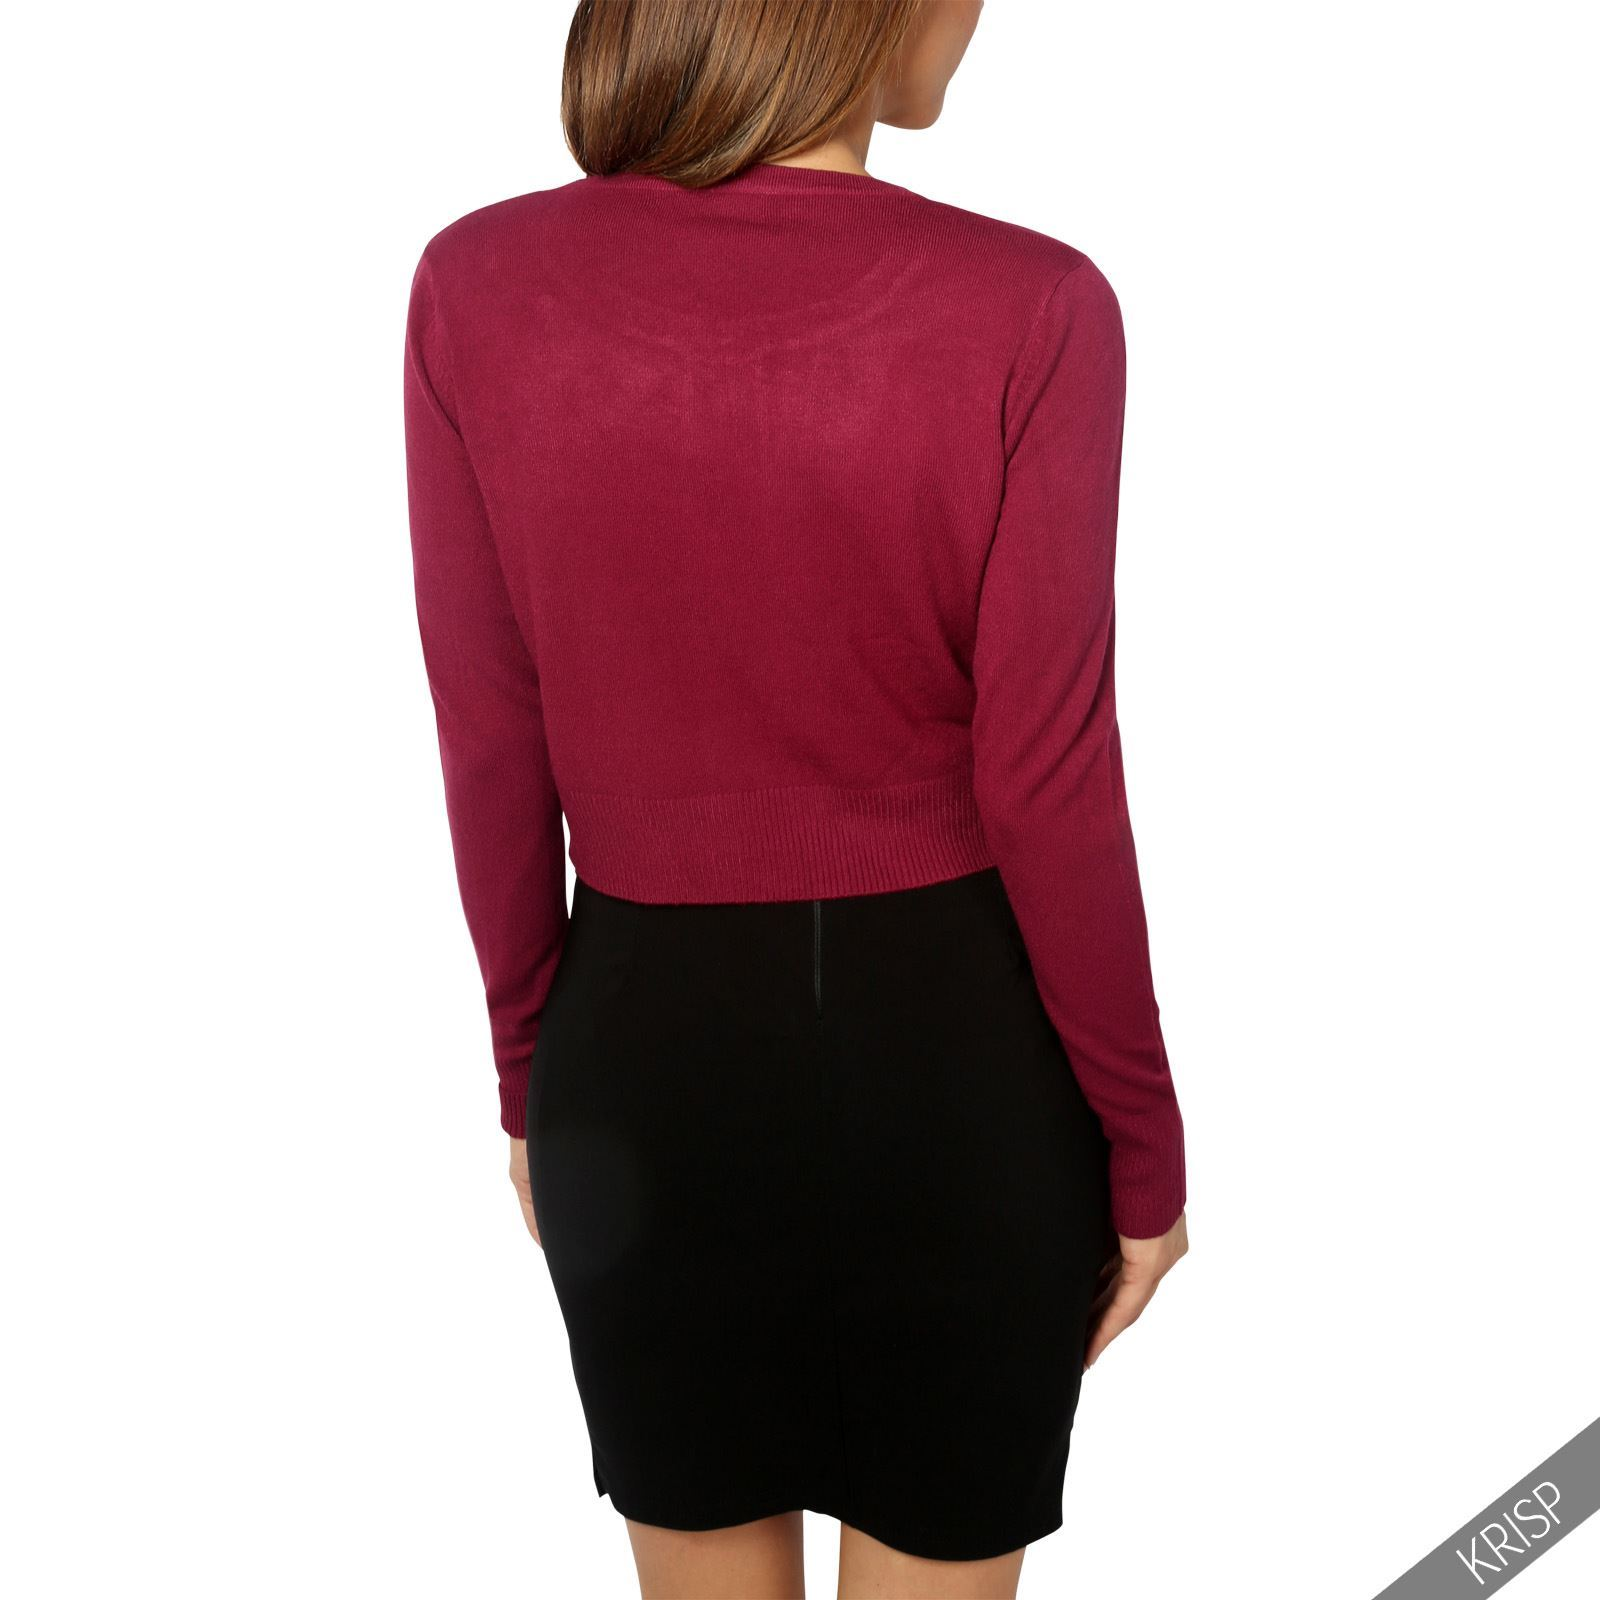 Womens-Ladies-Bolero-Shrug-Silky-Soft-Cardigan-Long-Sleeve-Knit-Short-Top-Work thumbnail 35